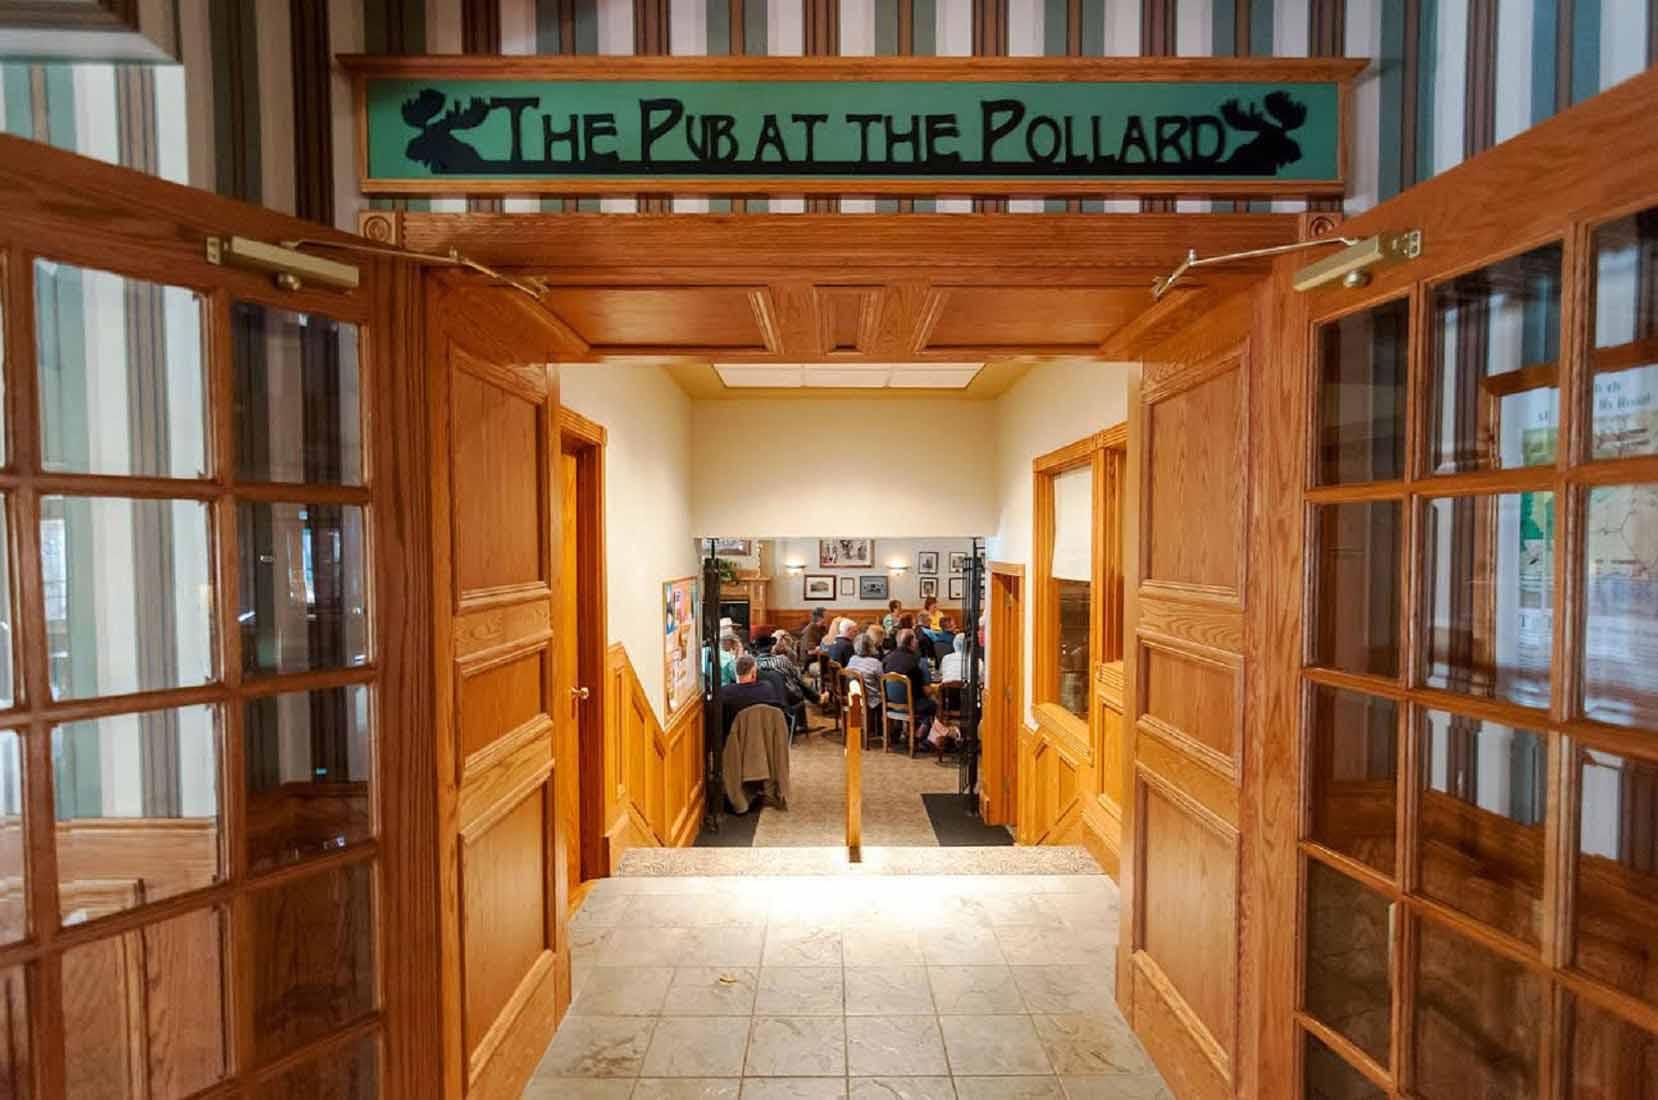 The Pub at The Pollard profile image